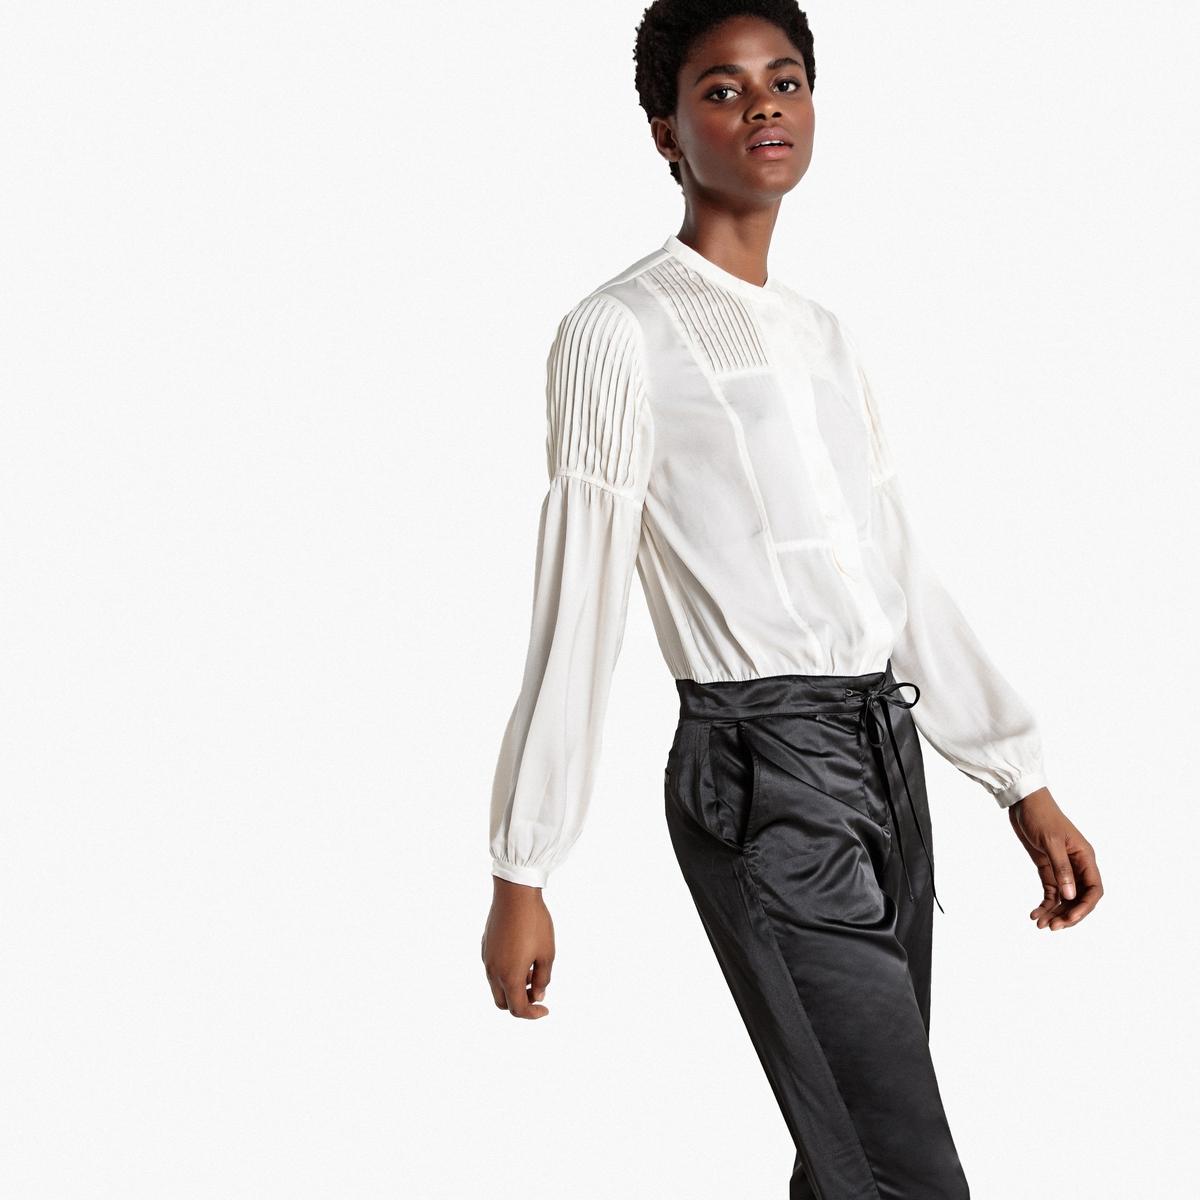 Tuta 2 in 1 camicetta in satin plissettata/pantaloni